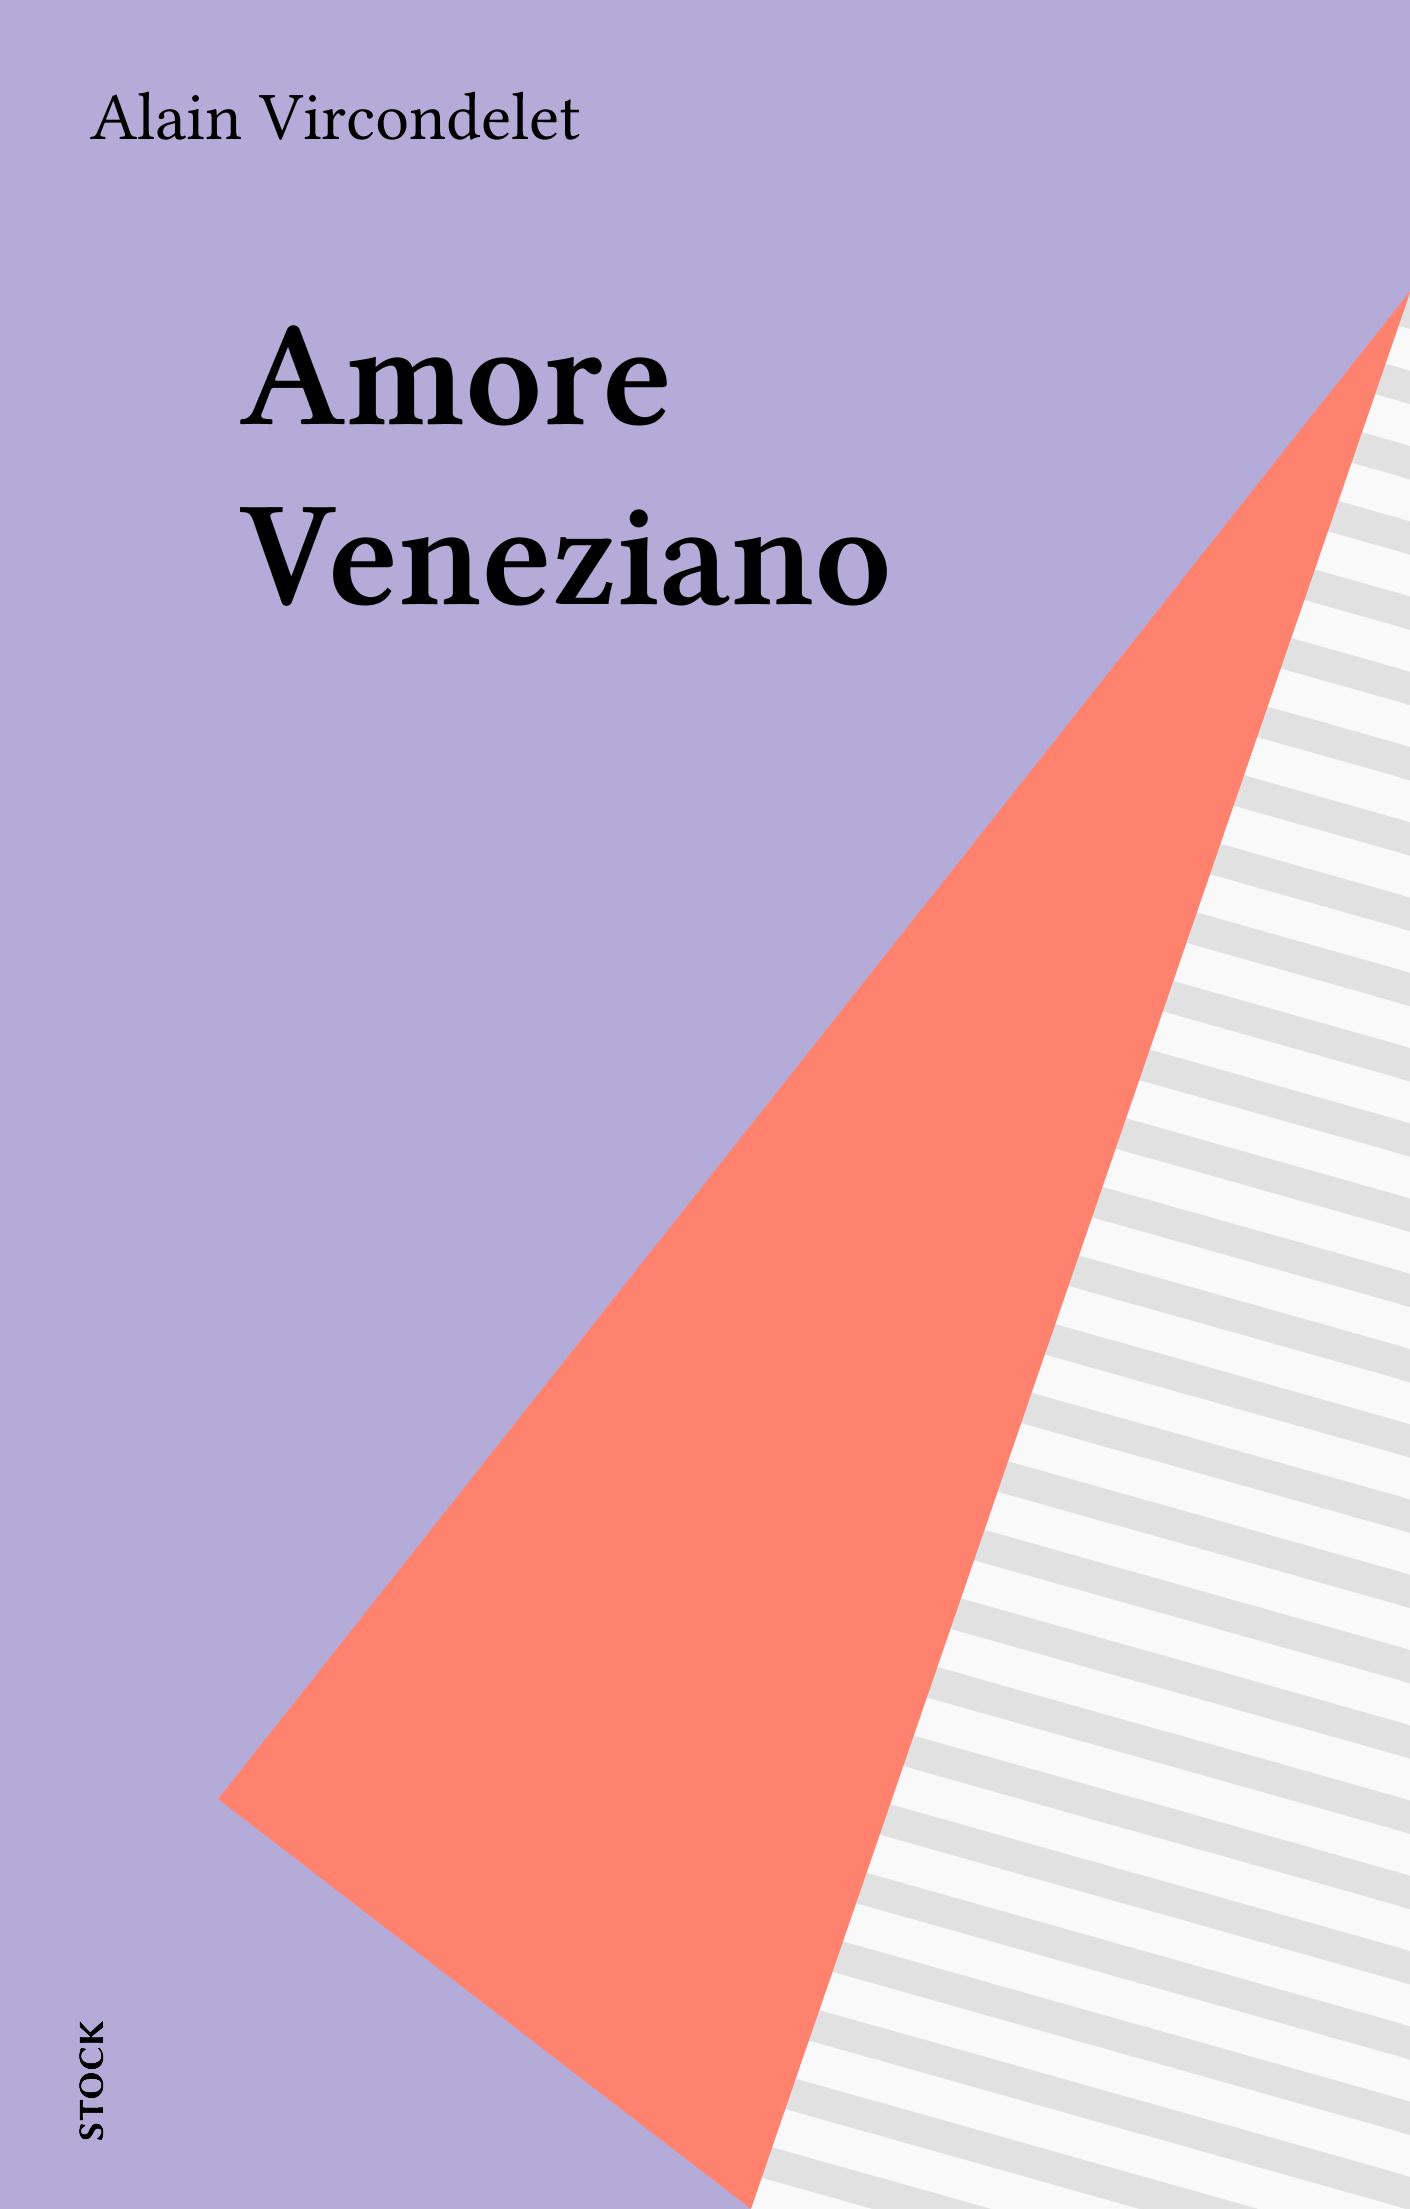 Amore Veneziano